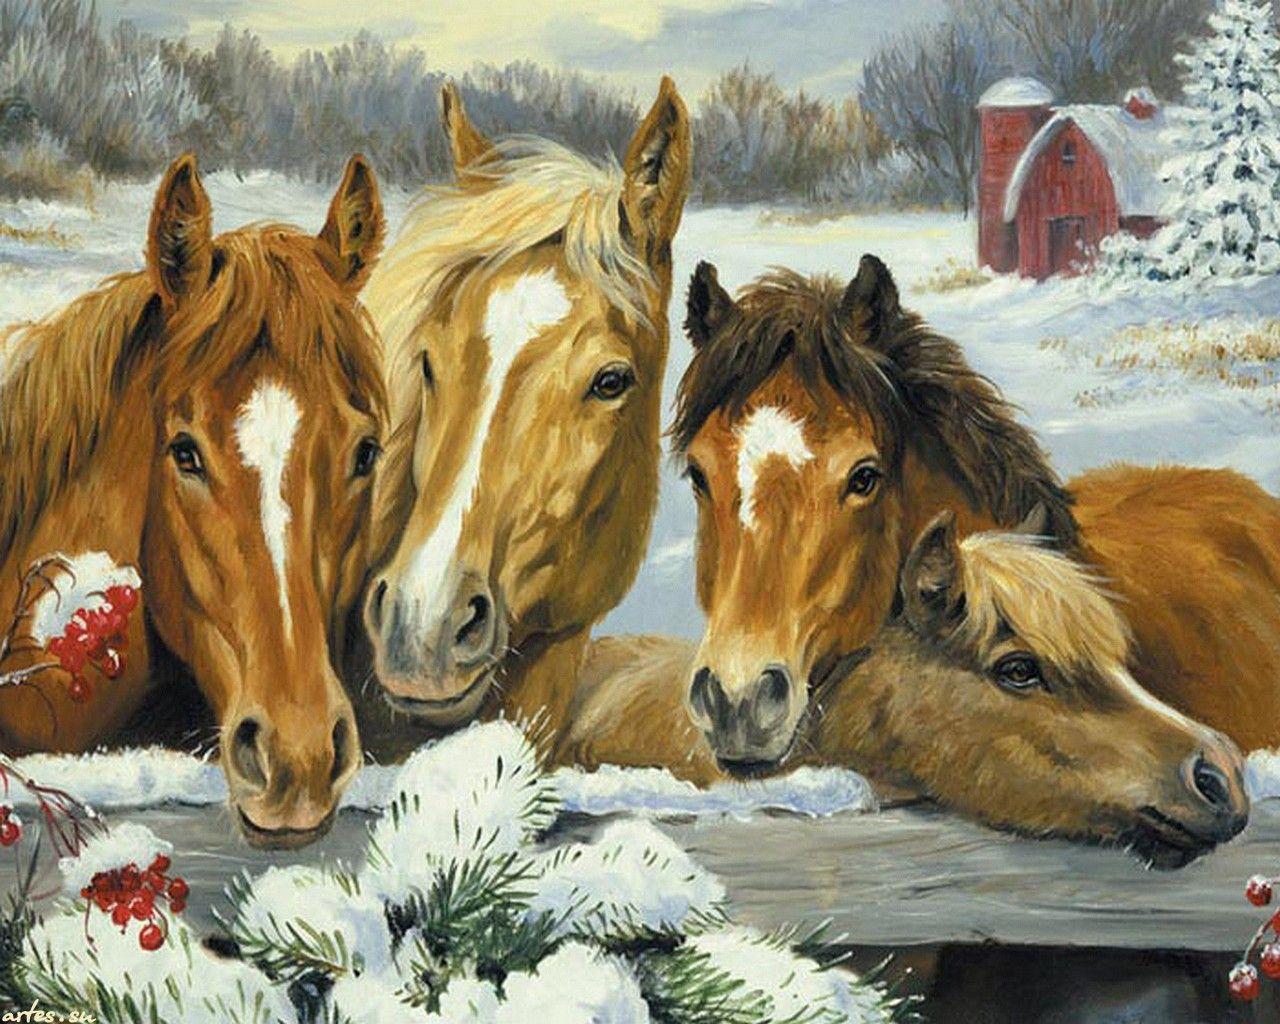 Best Wallpaper Horse Vintage - b74941ce4824c97f0ed14817c84f6513  Image_458945.jpg